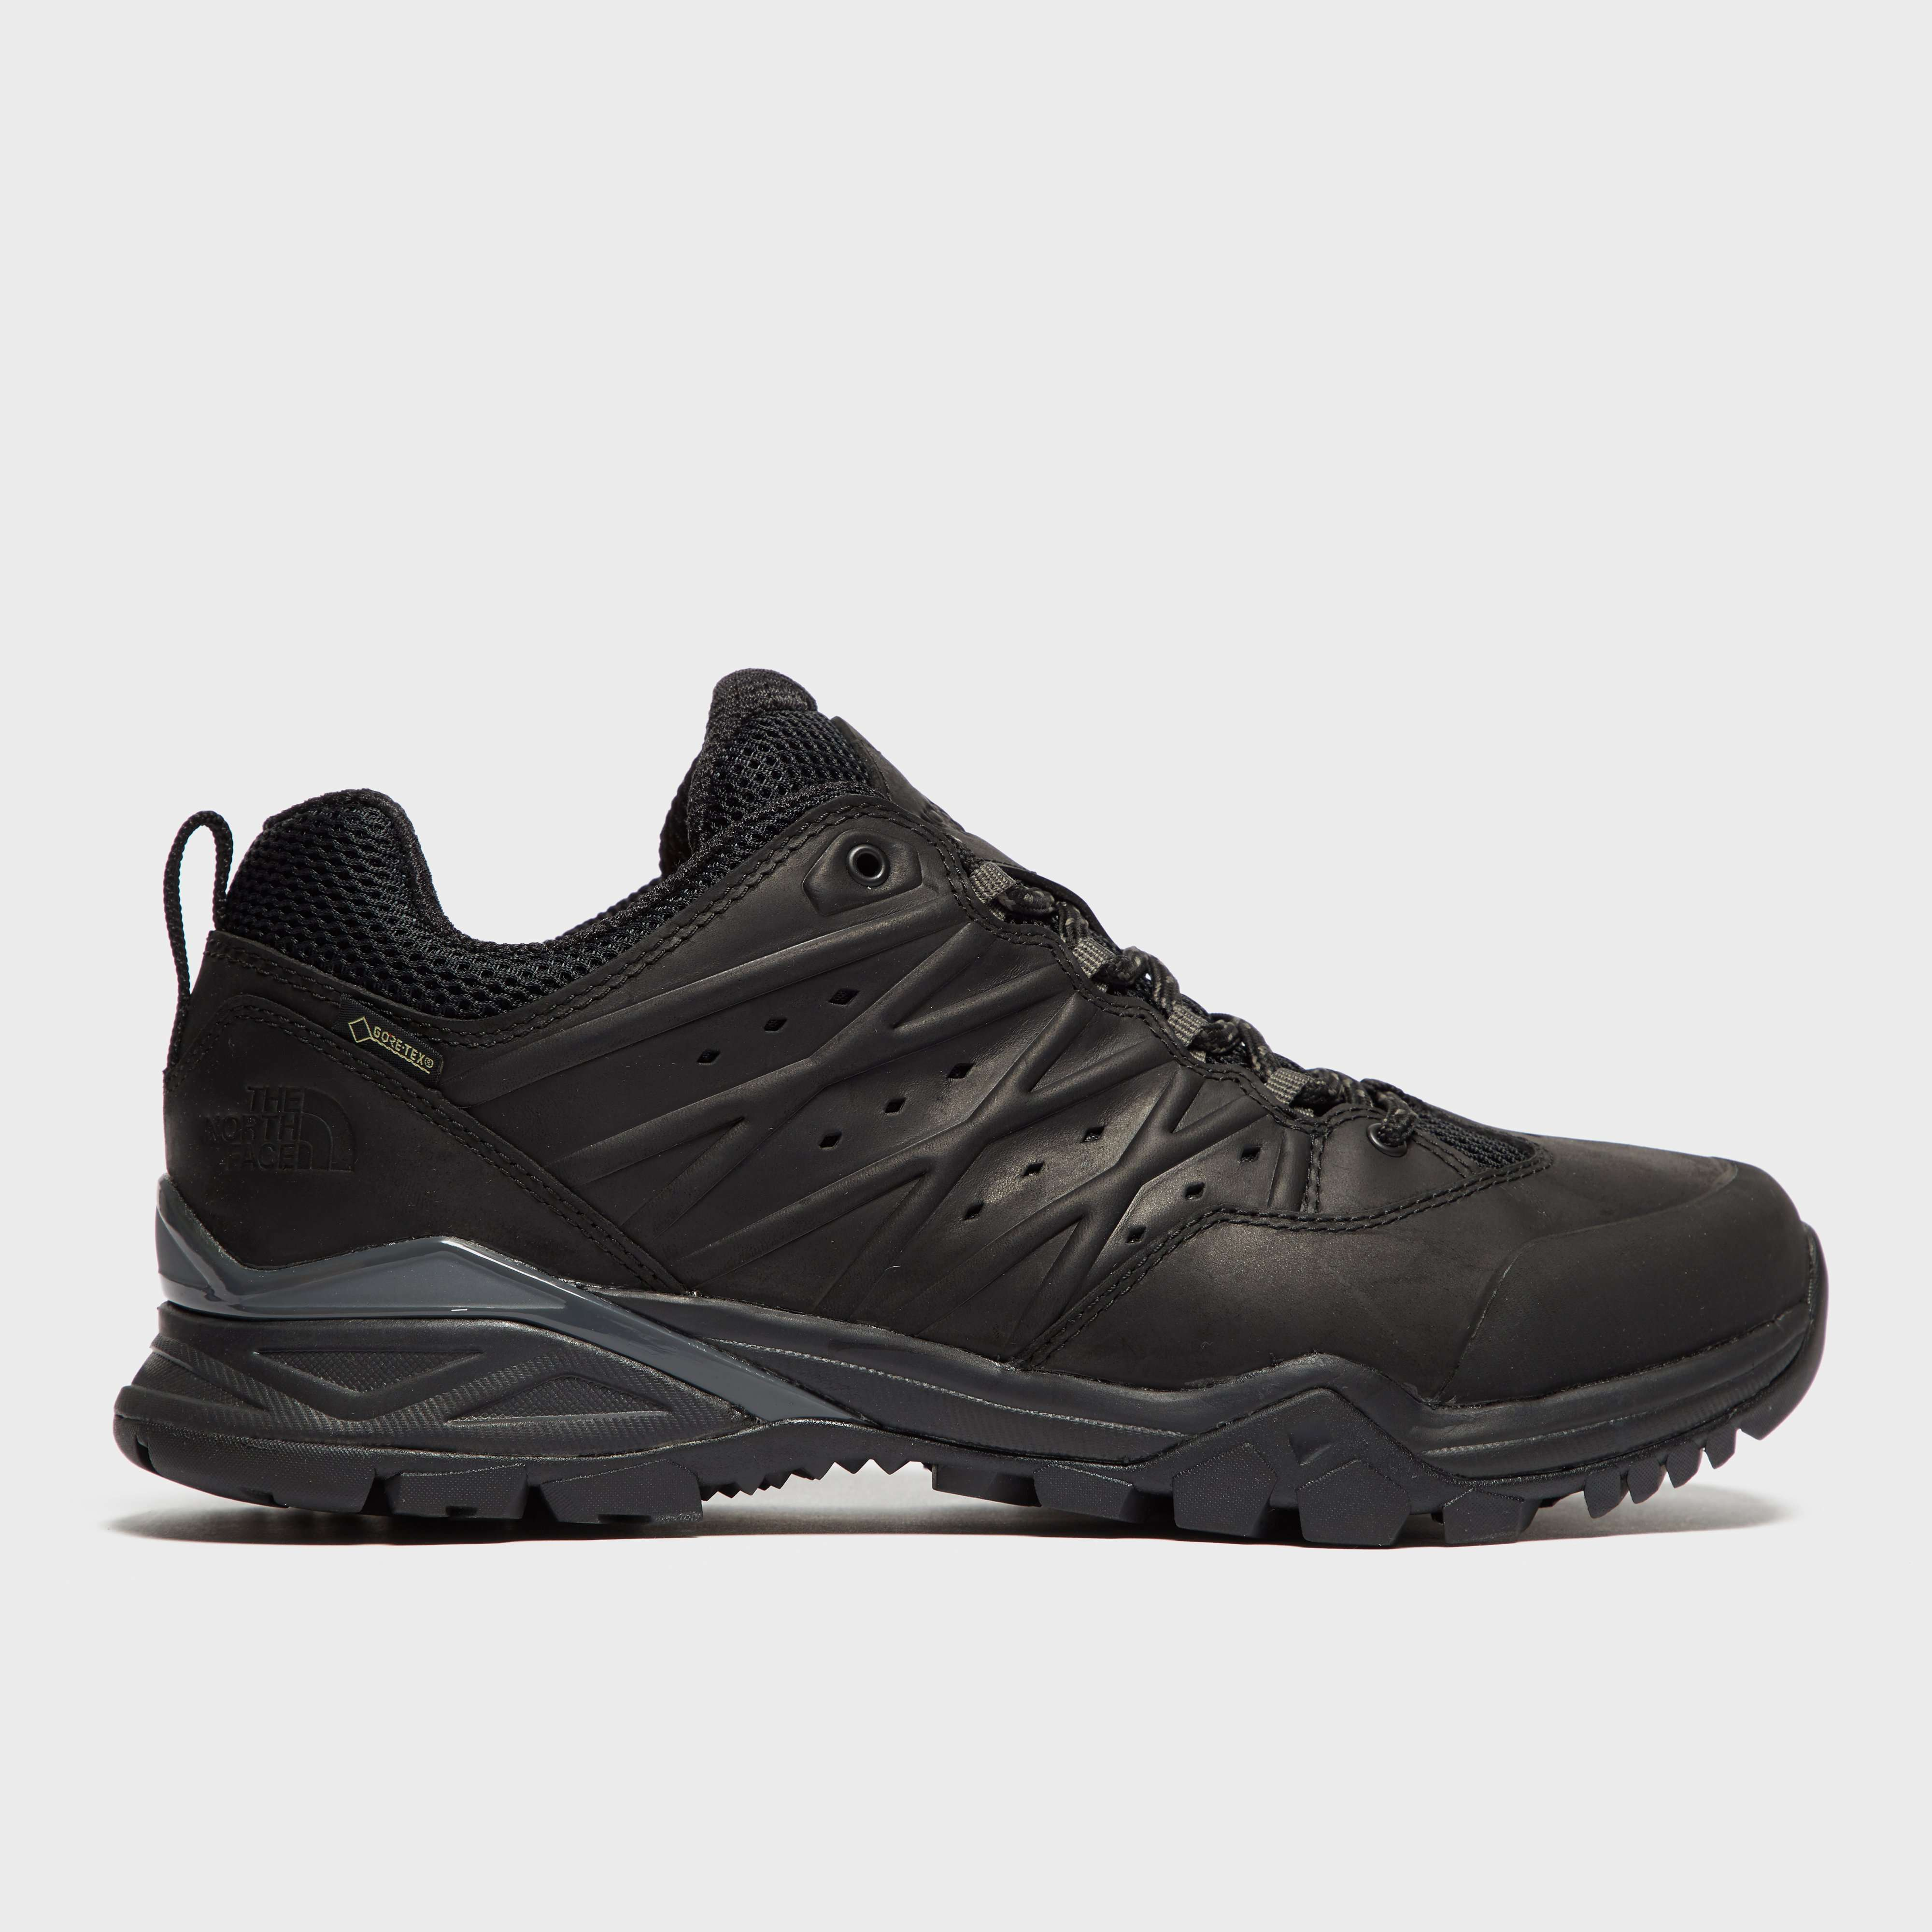 THE NORTH FACE Men's Hedgehog Hike II GORE-TEX® Shoe